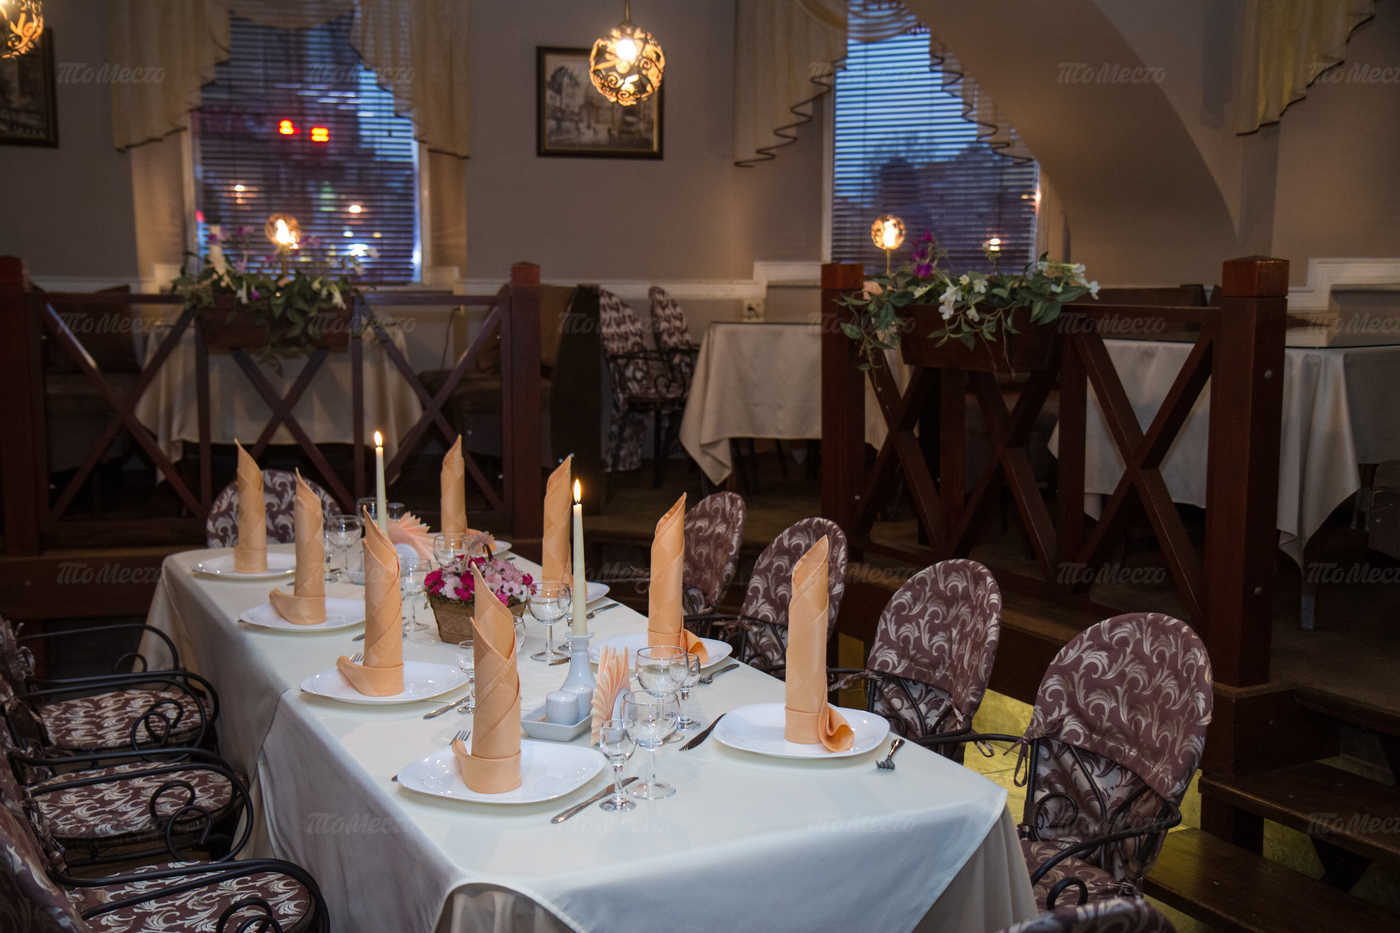 Меню бара, кафе, ресторана Аларчин мост на проспекте Римского-Корсакова